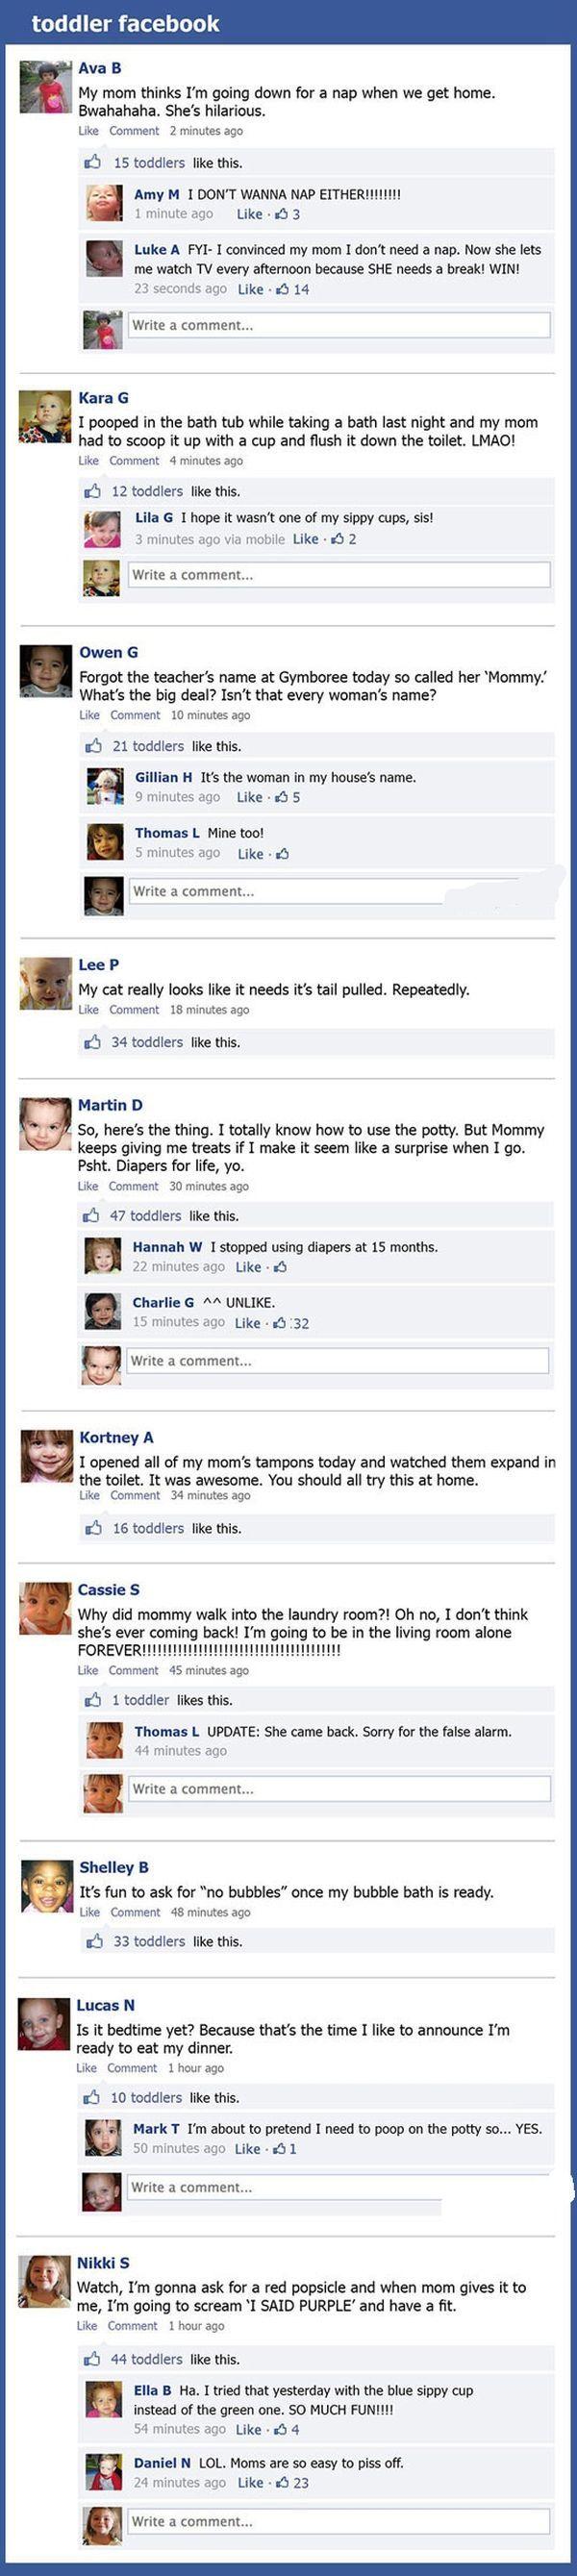 Toddler Facebook